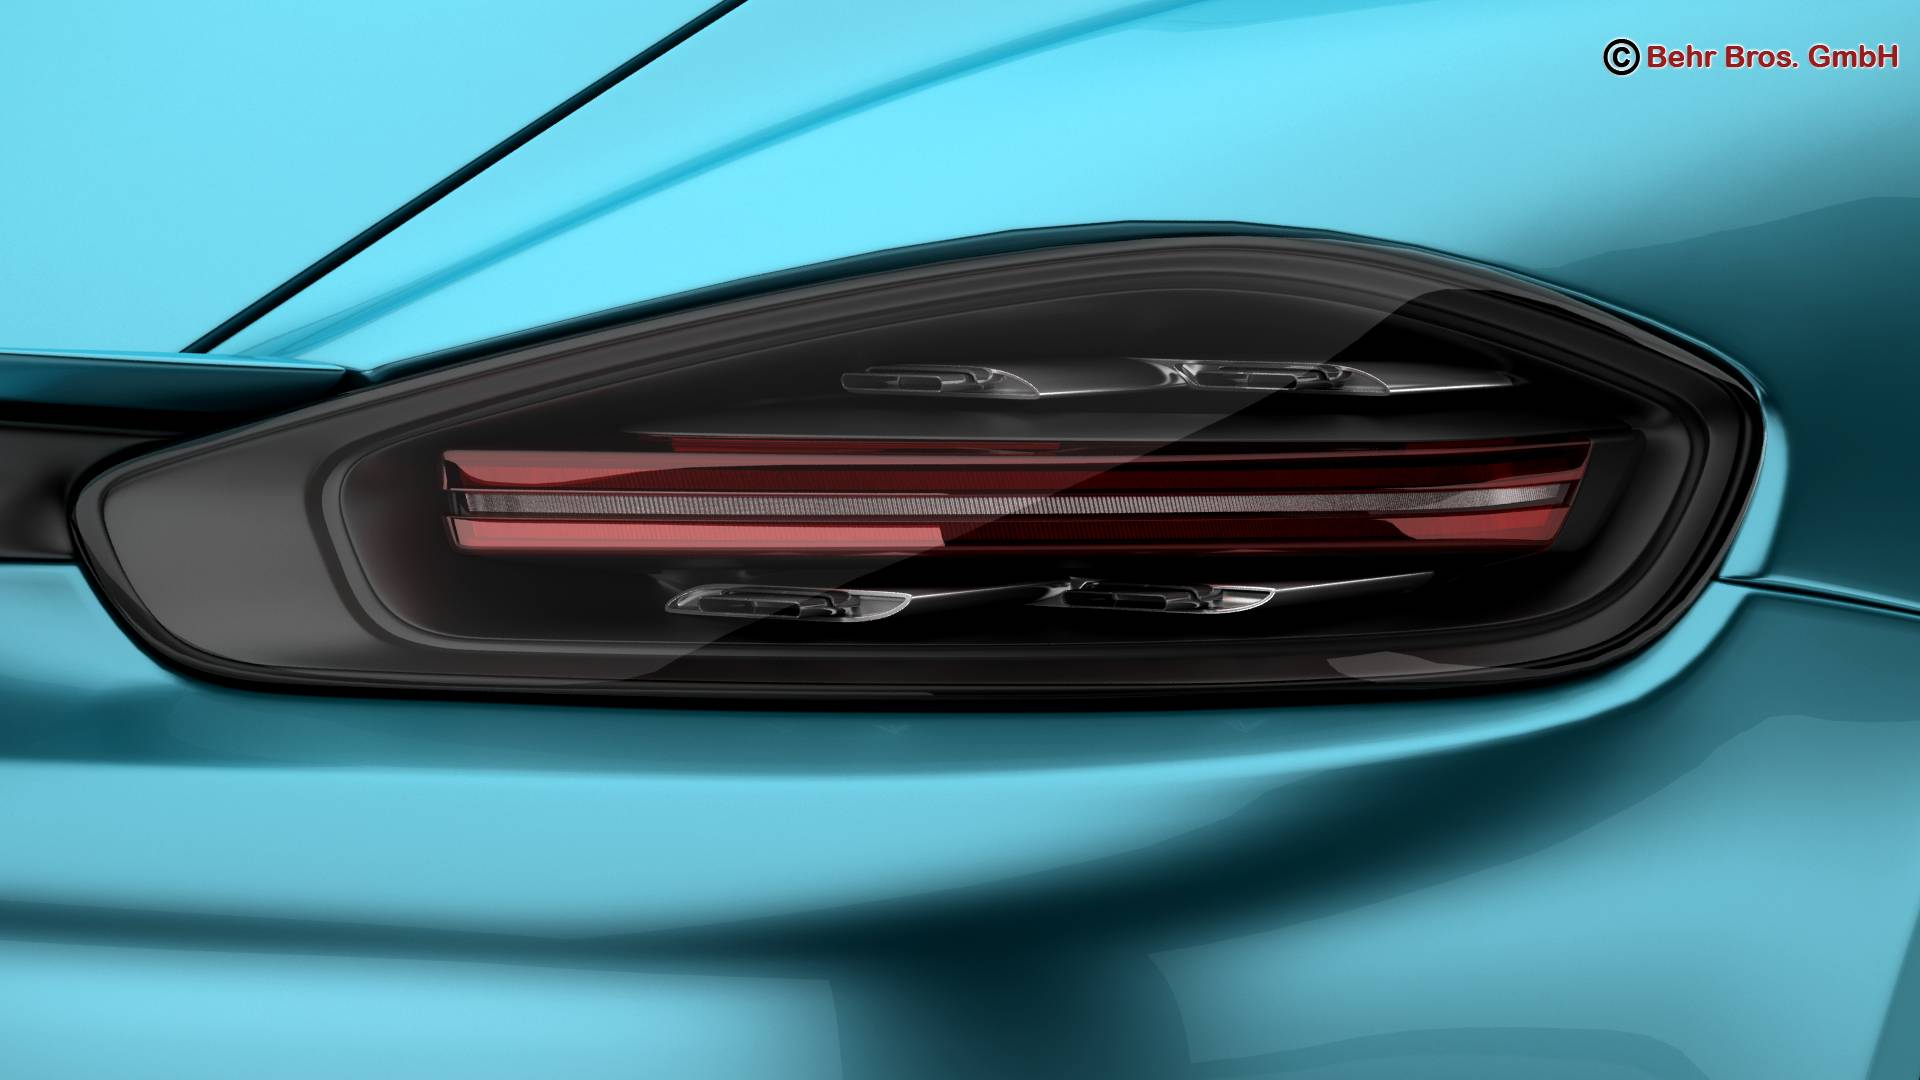 porsche 718 cayman s 2017 3d model 3ds max fbx c4d lwo ma mb obj 220112